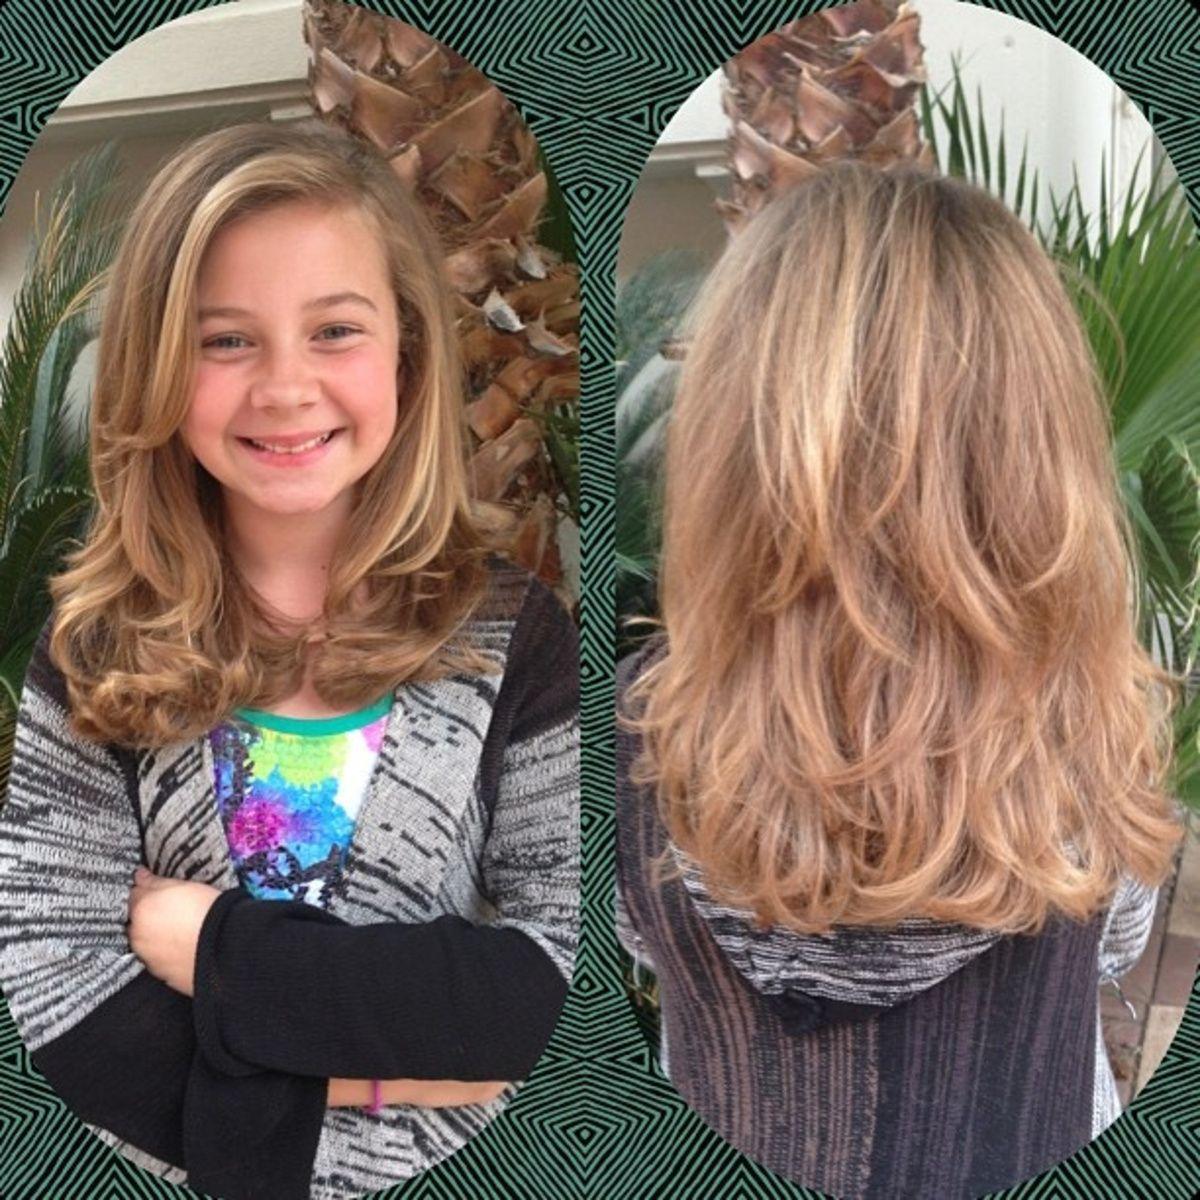 Pin By Marni Clark On Hair In 2018 Pinterest Kids Cuts Haircuts